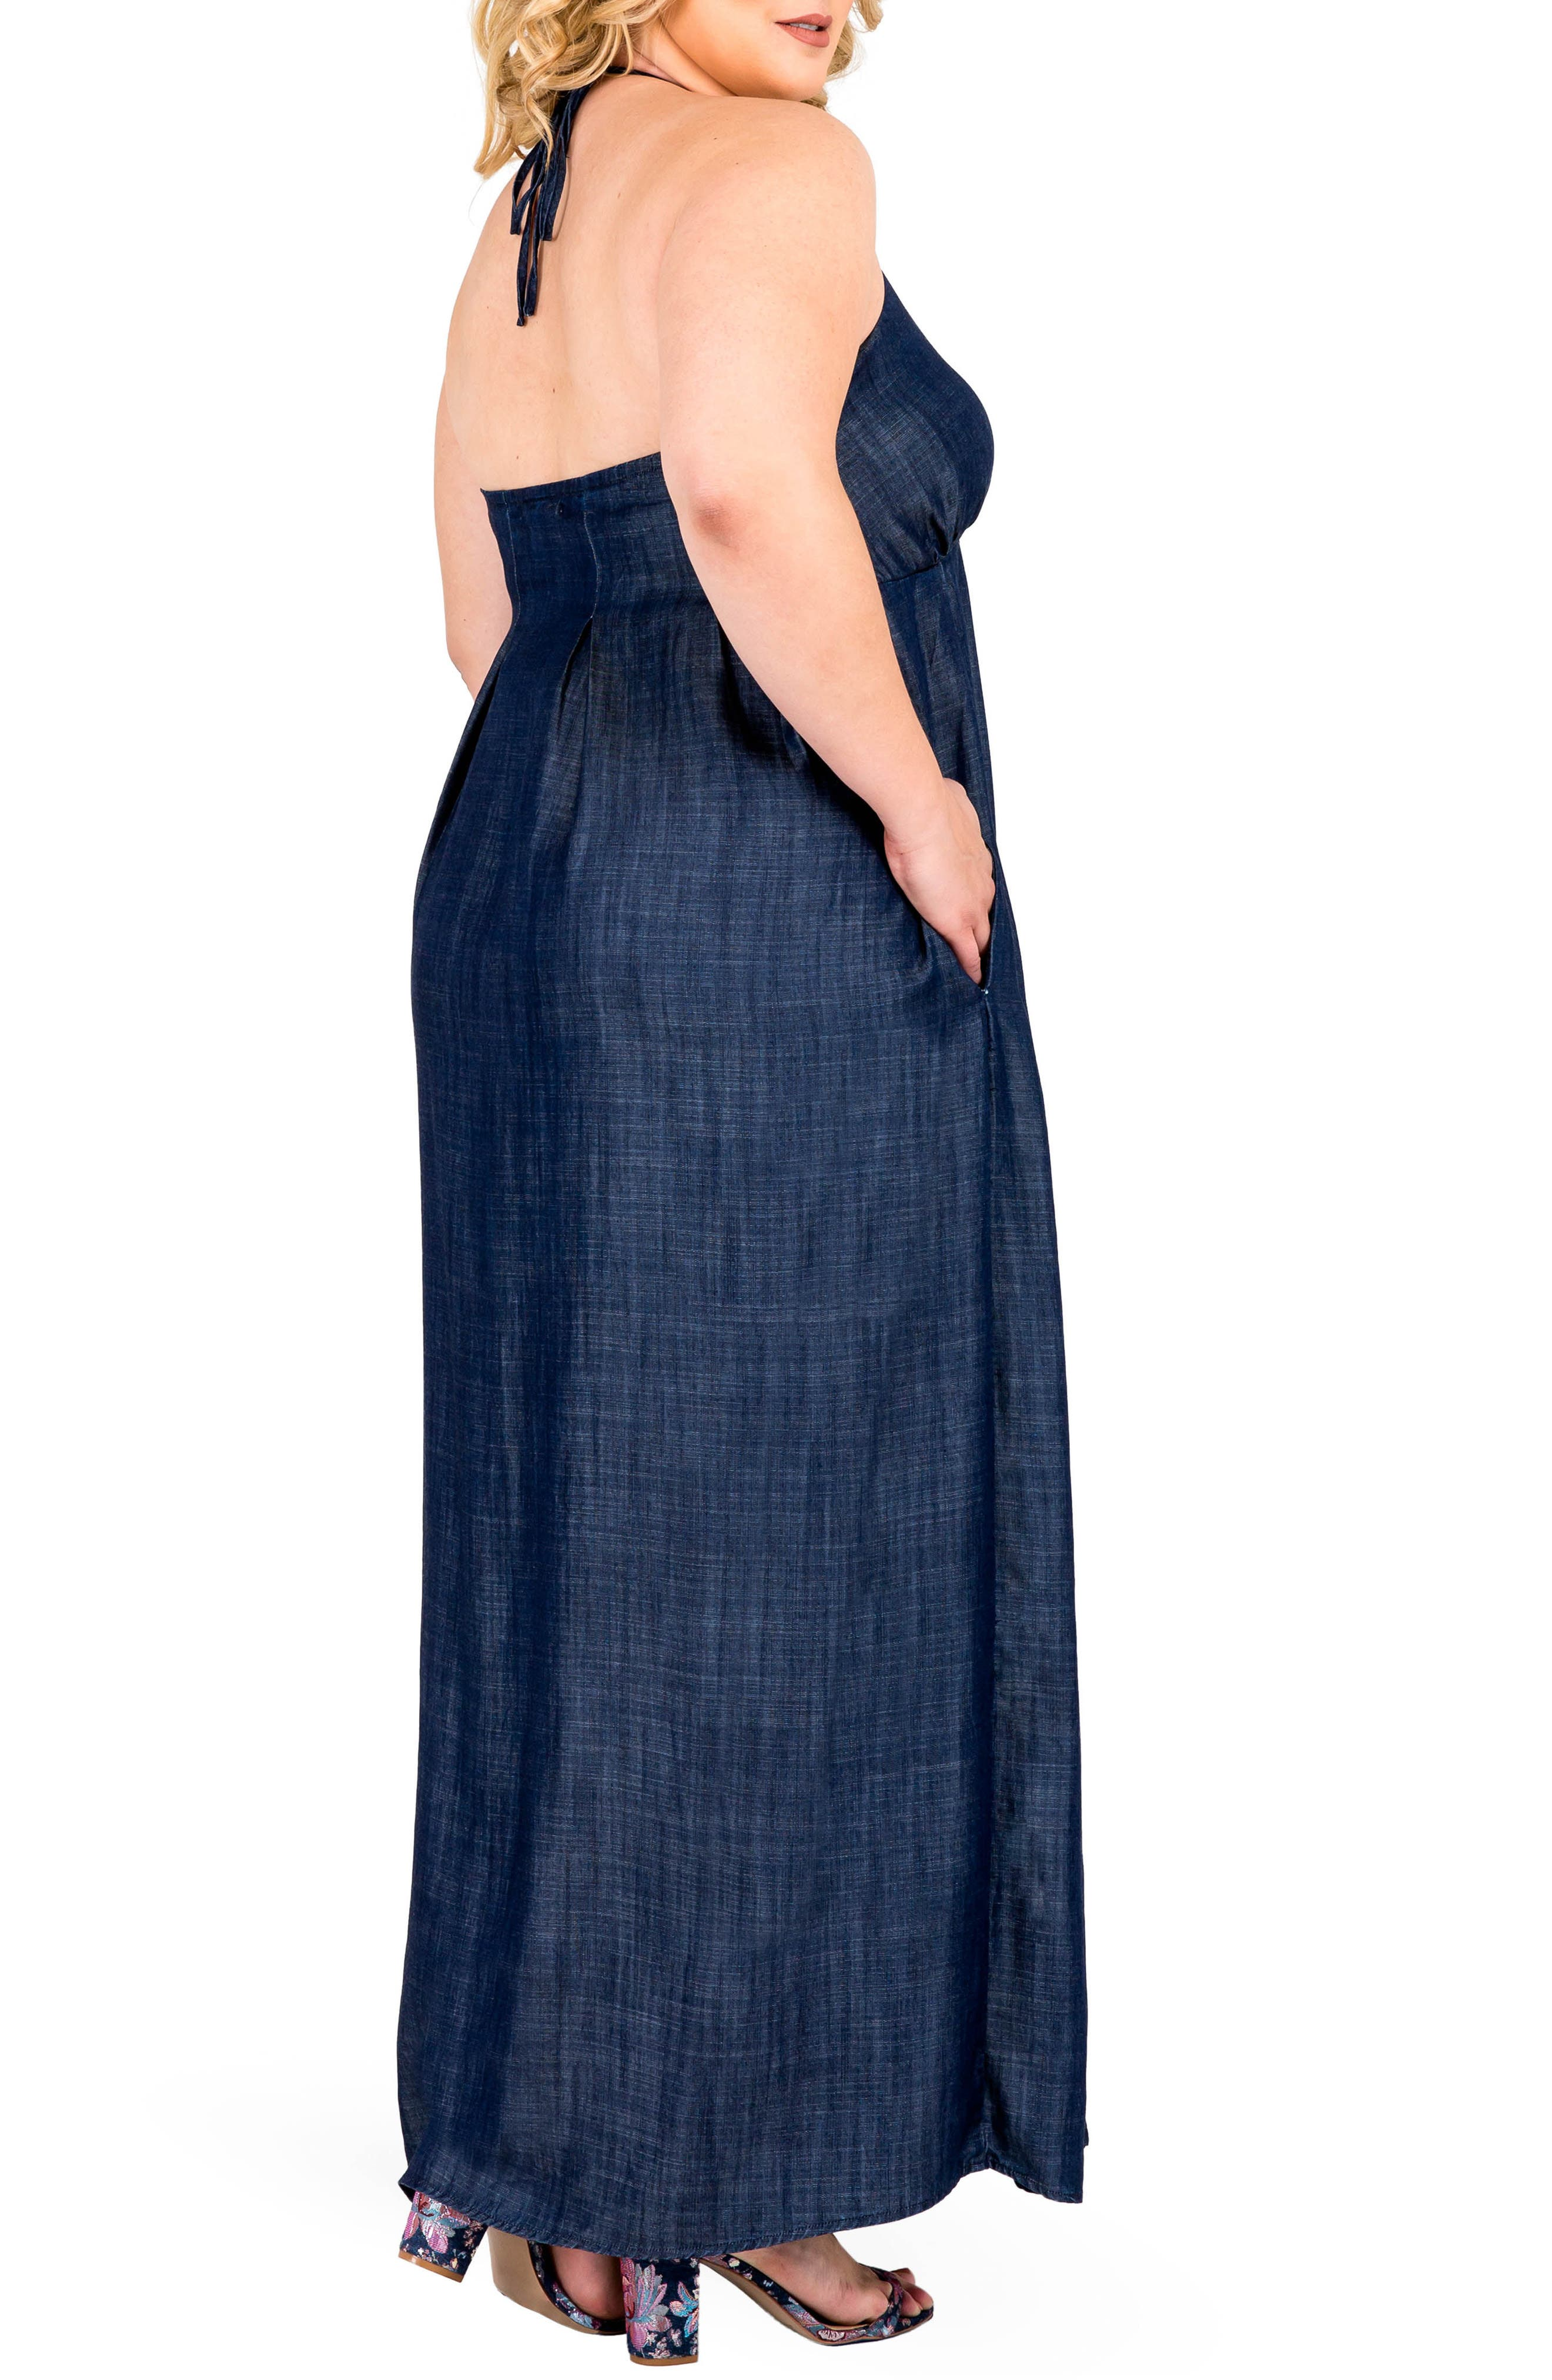 Maui Maxi Chambray Halter Dress,                             Alternate thumbnail 3, color,                             DARK BLUE